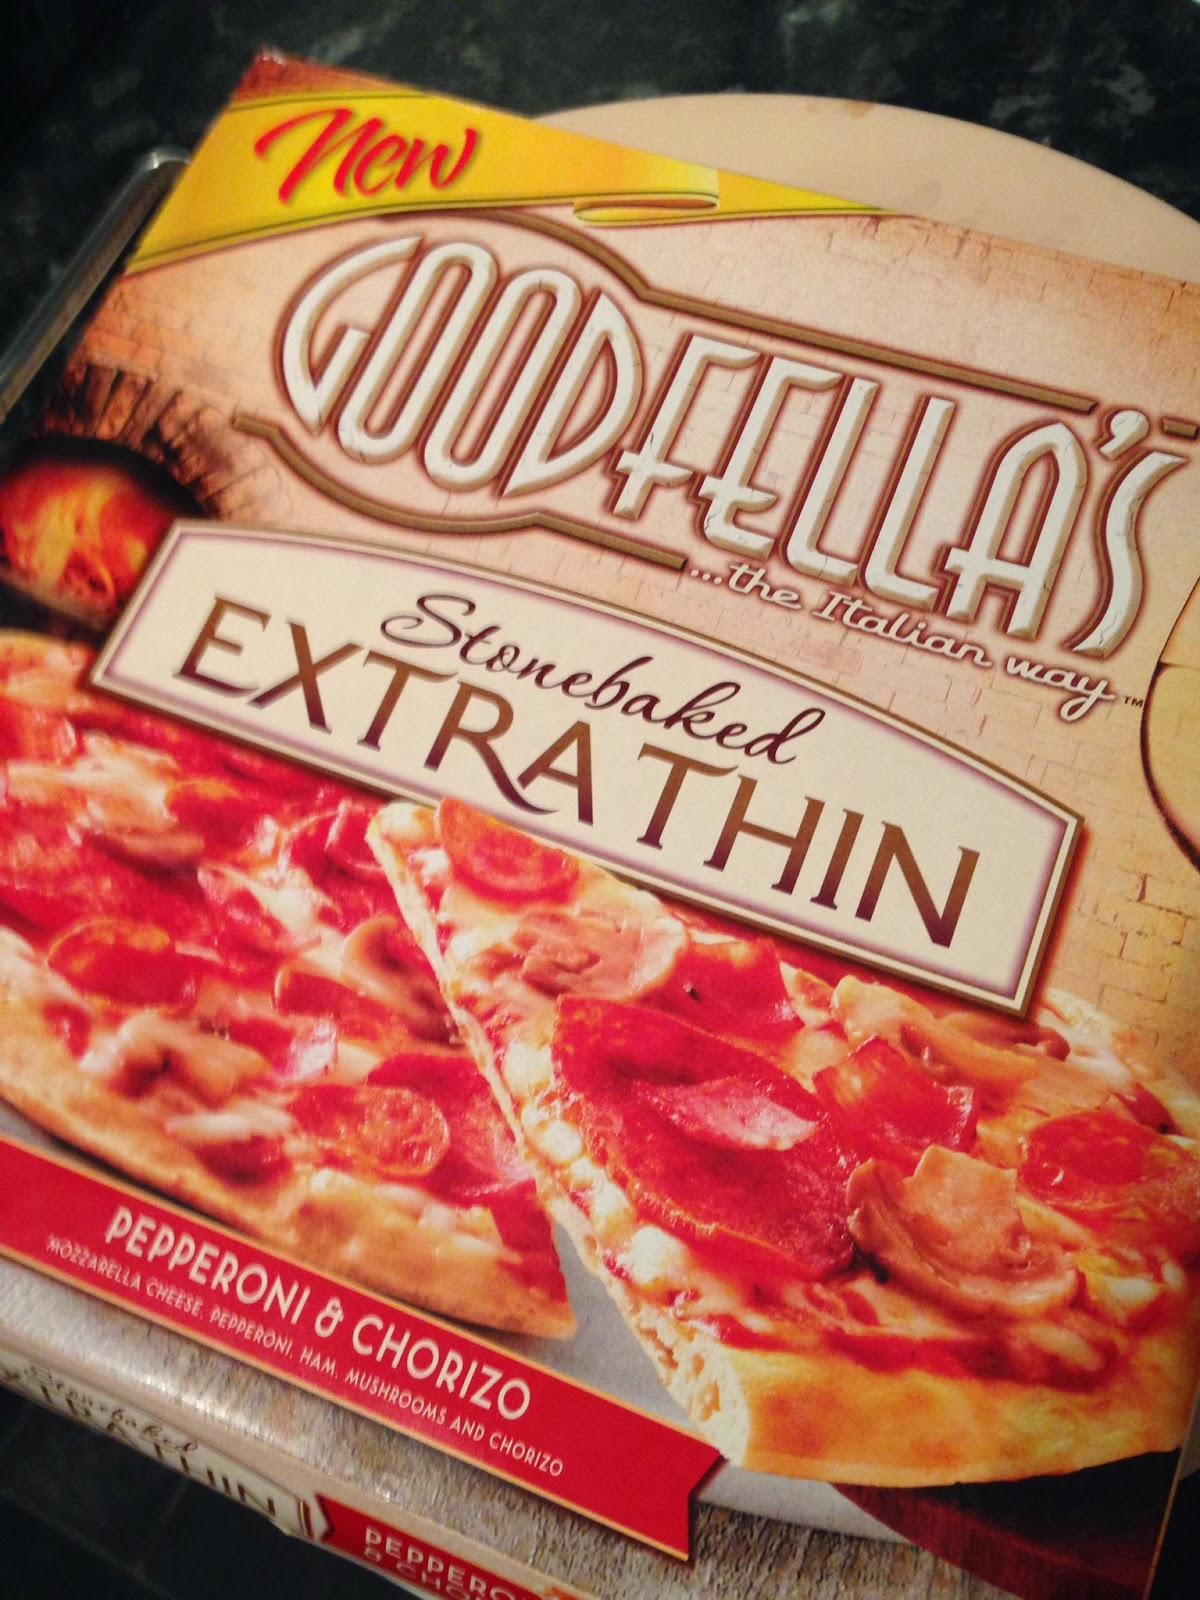 goodfellas exrtra thin pepperoni and chorizo pizza